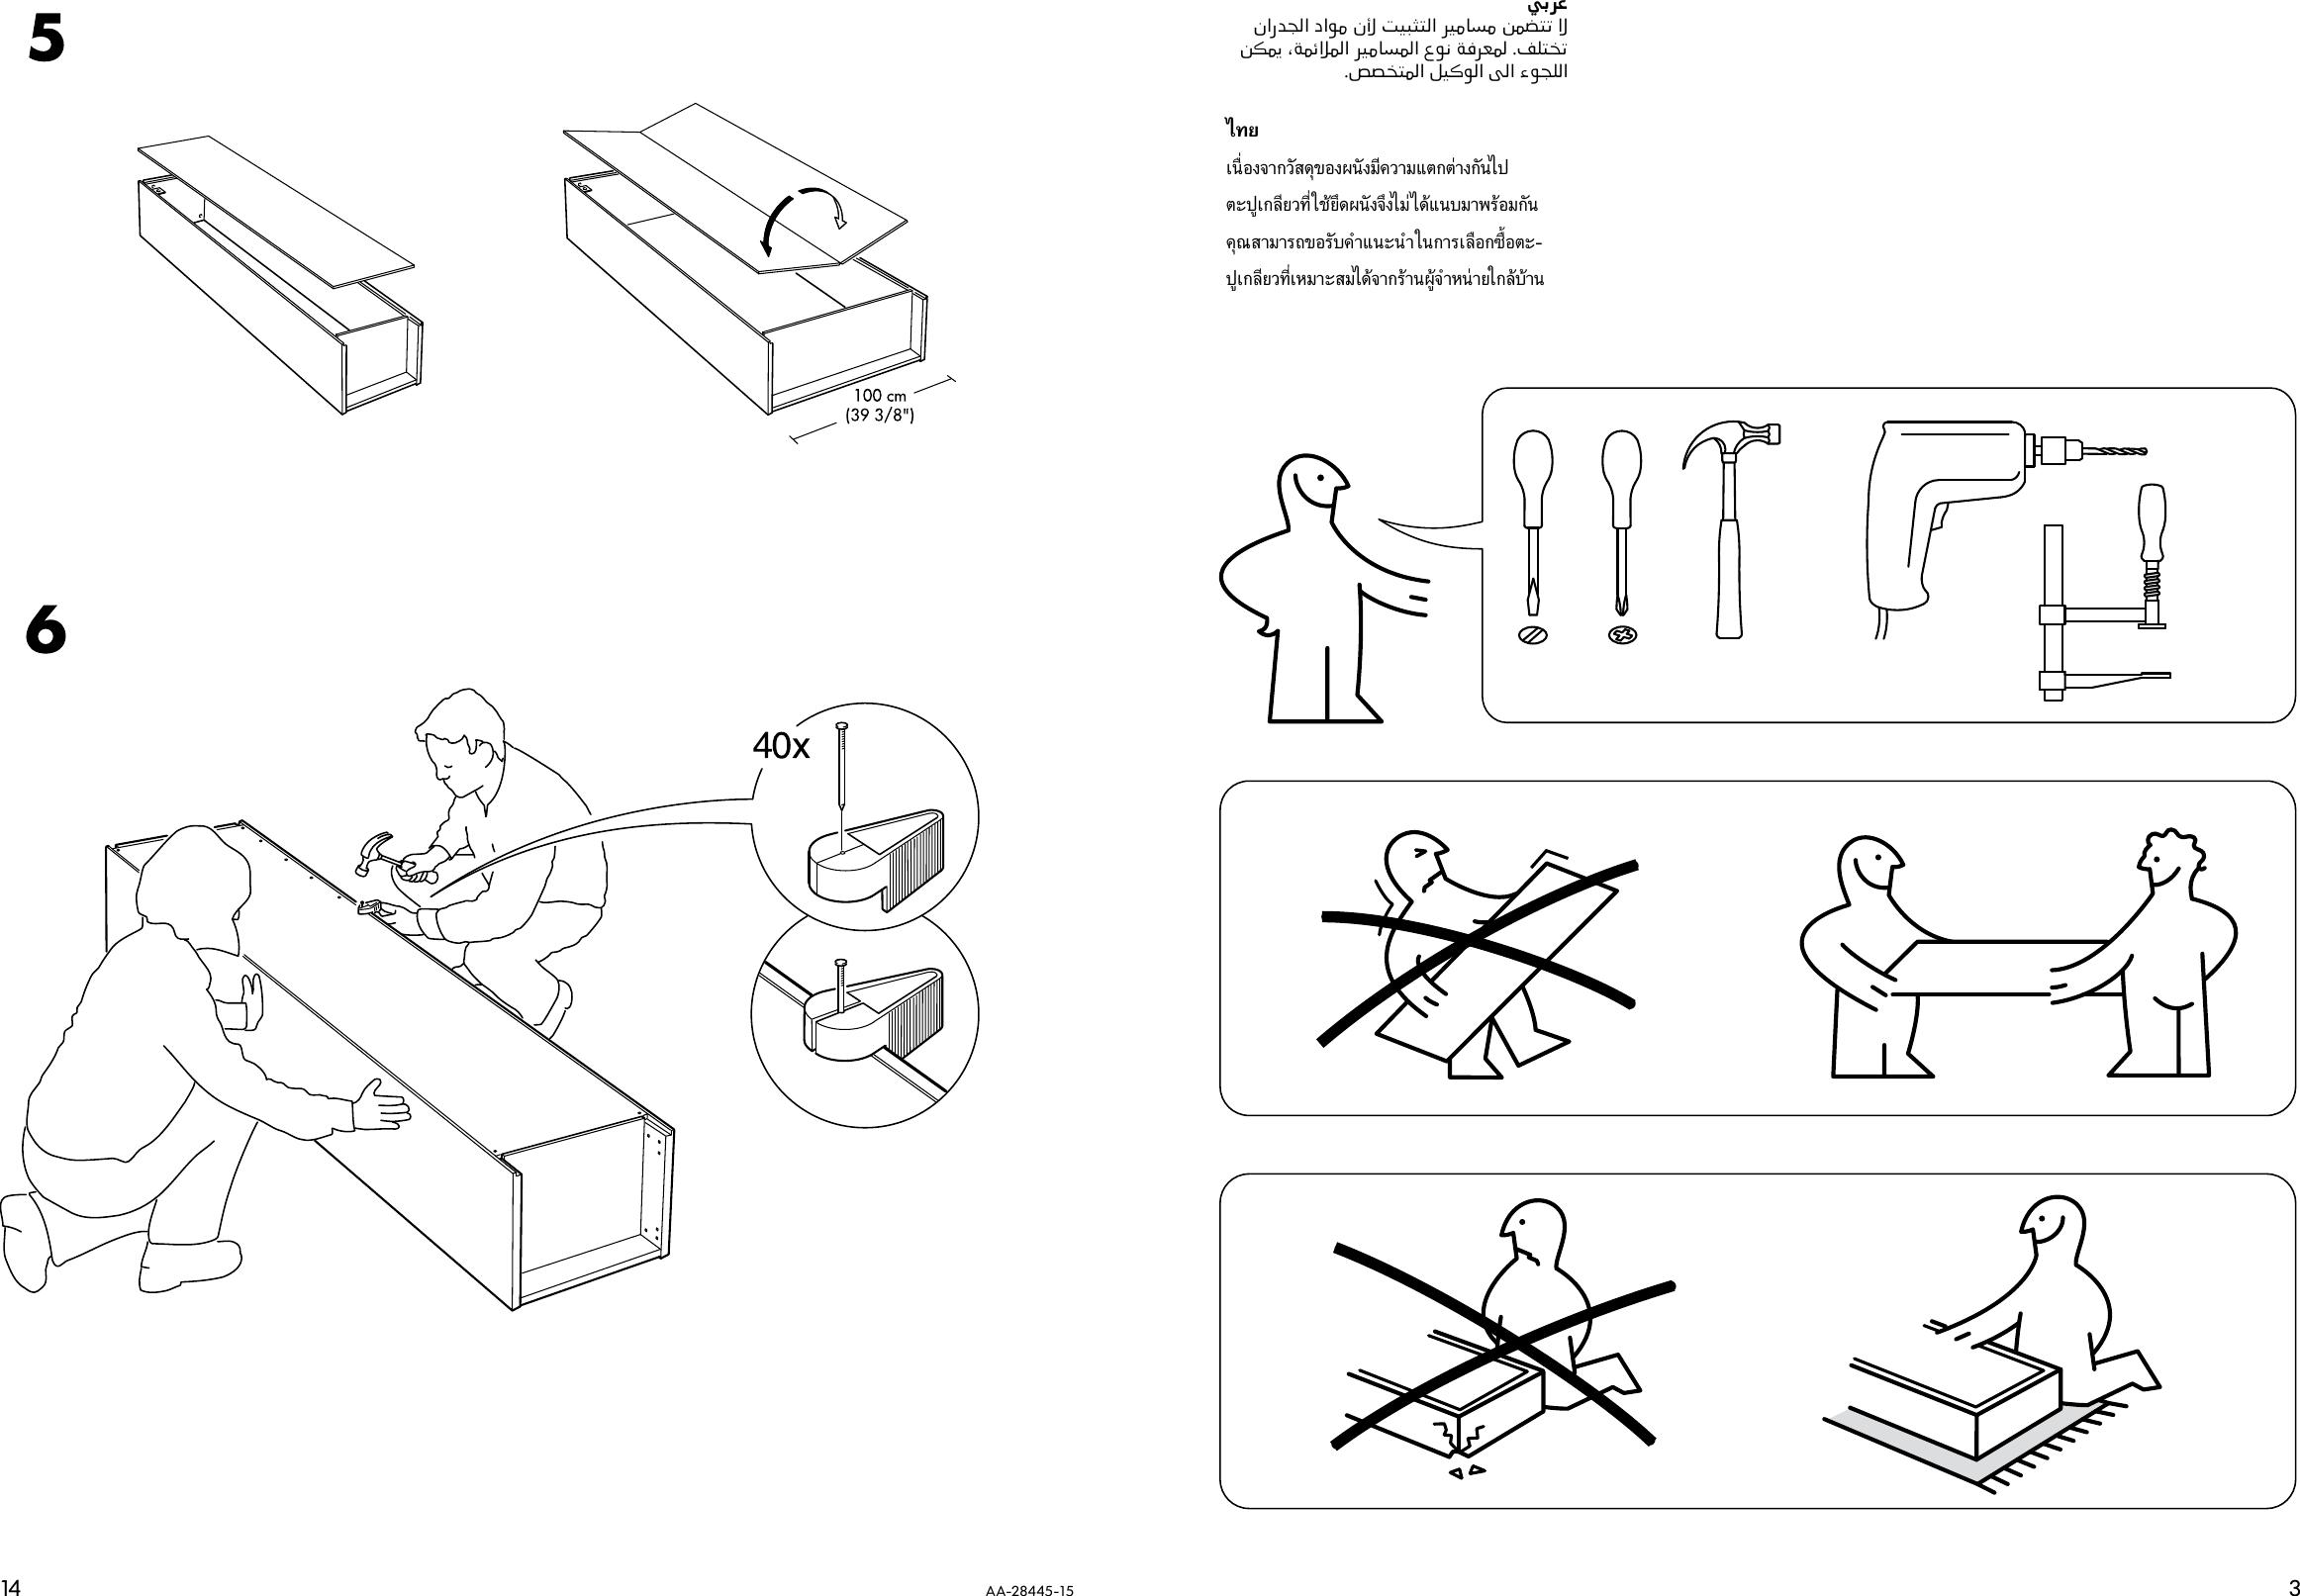 pax wardrobe assembly instructions pdf